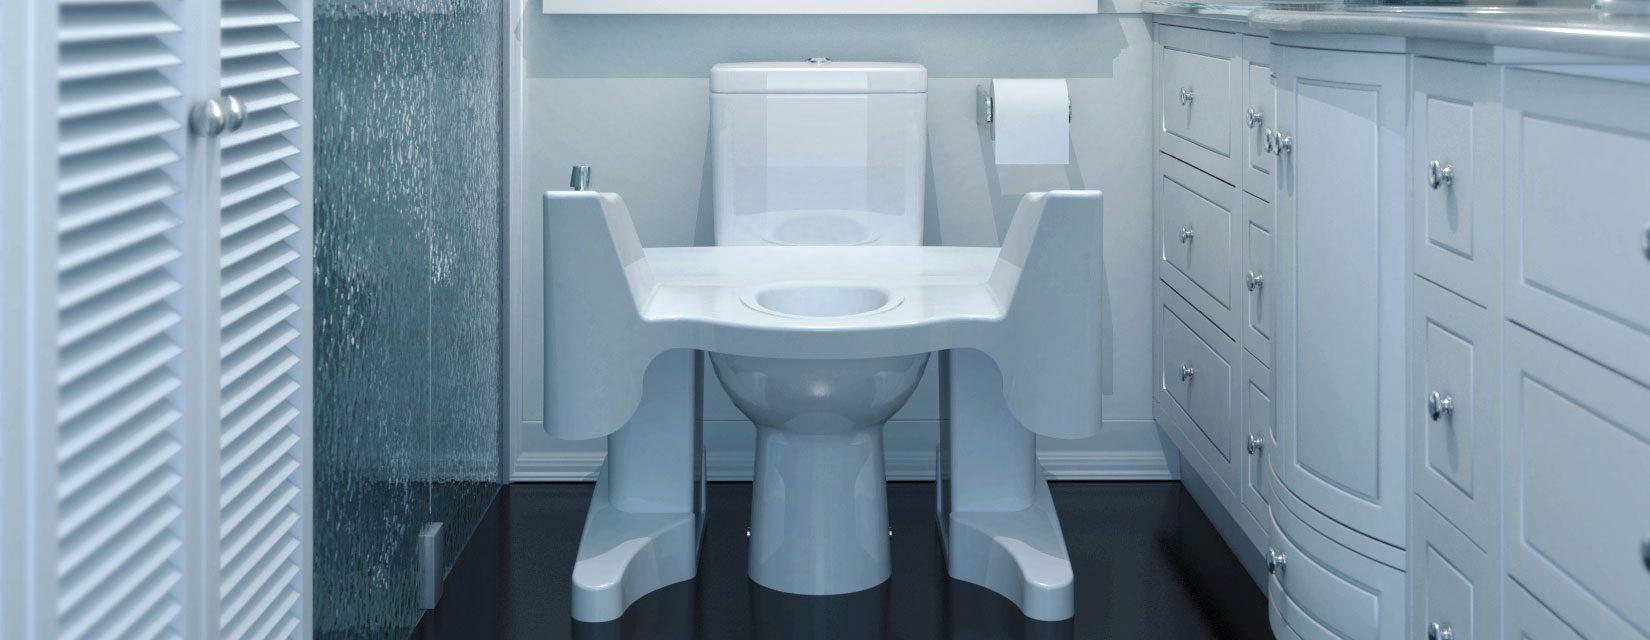 Toilet Lift System   MasterCare Patient Equipment